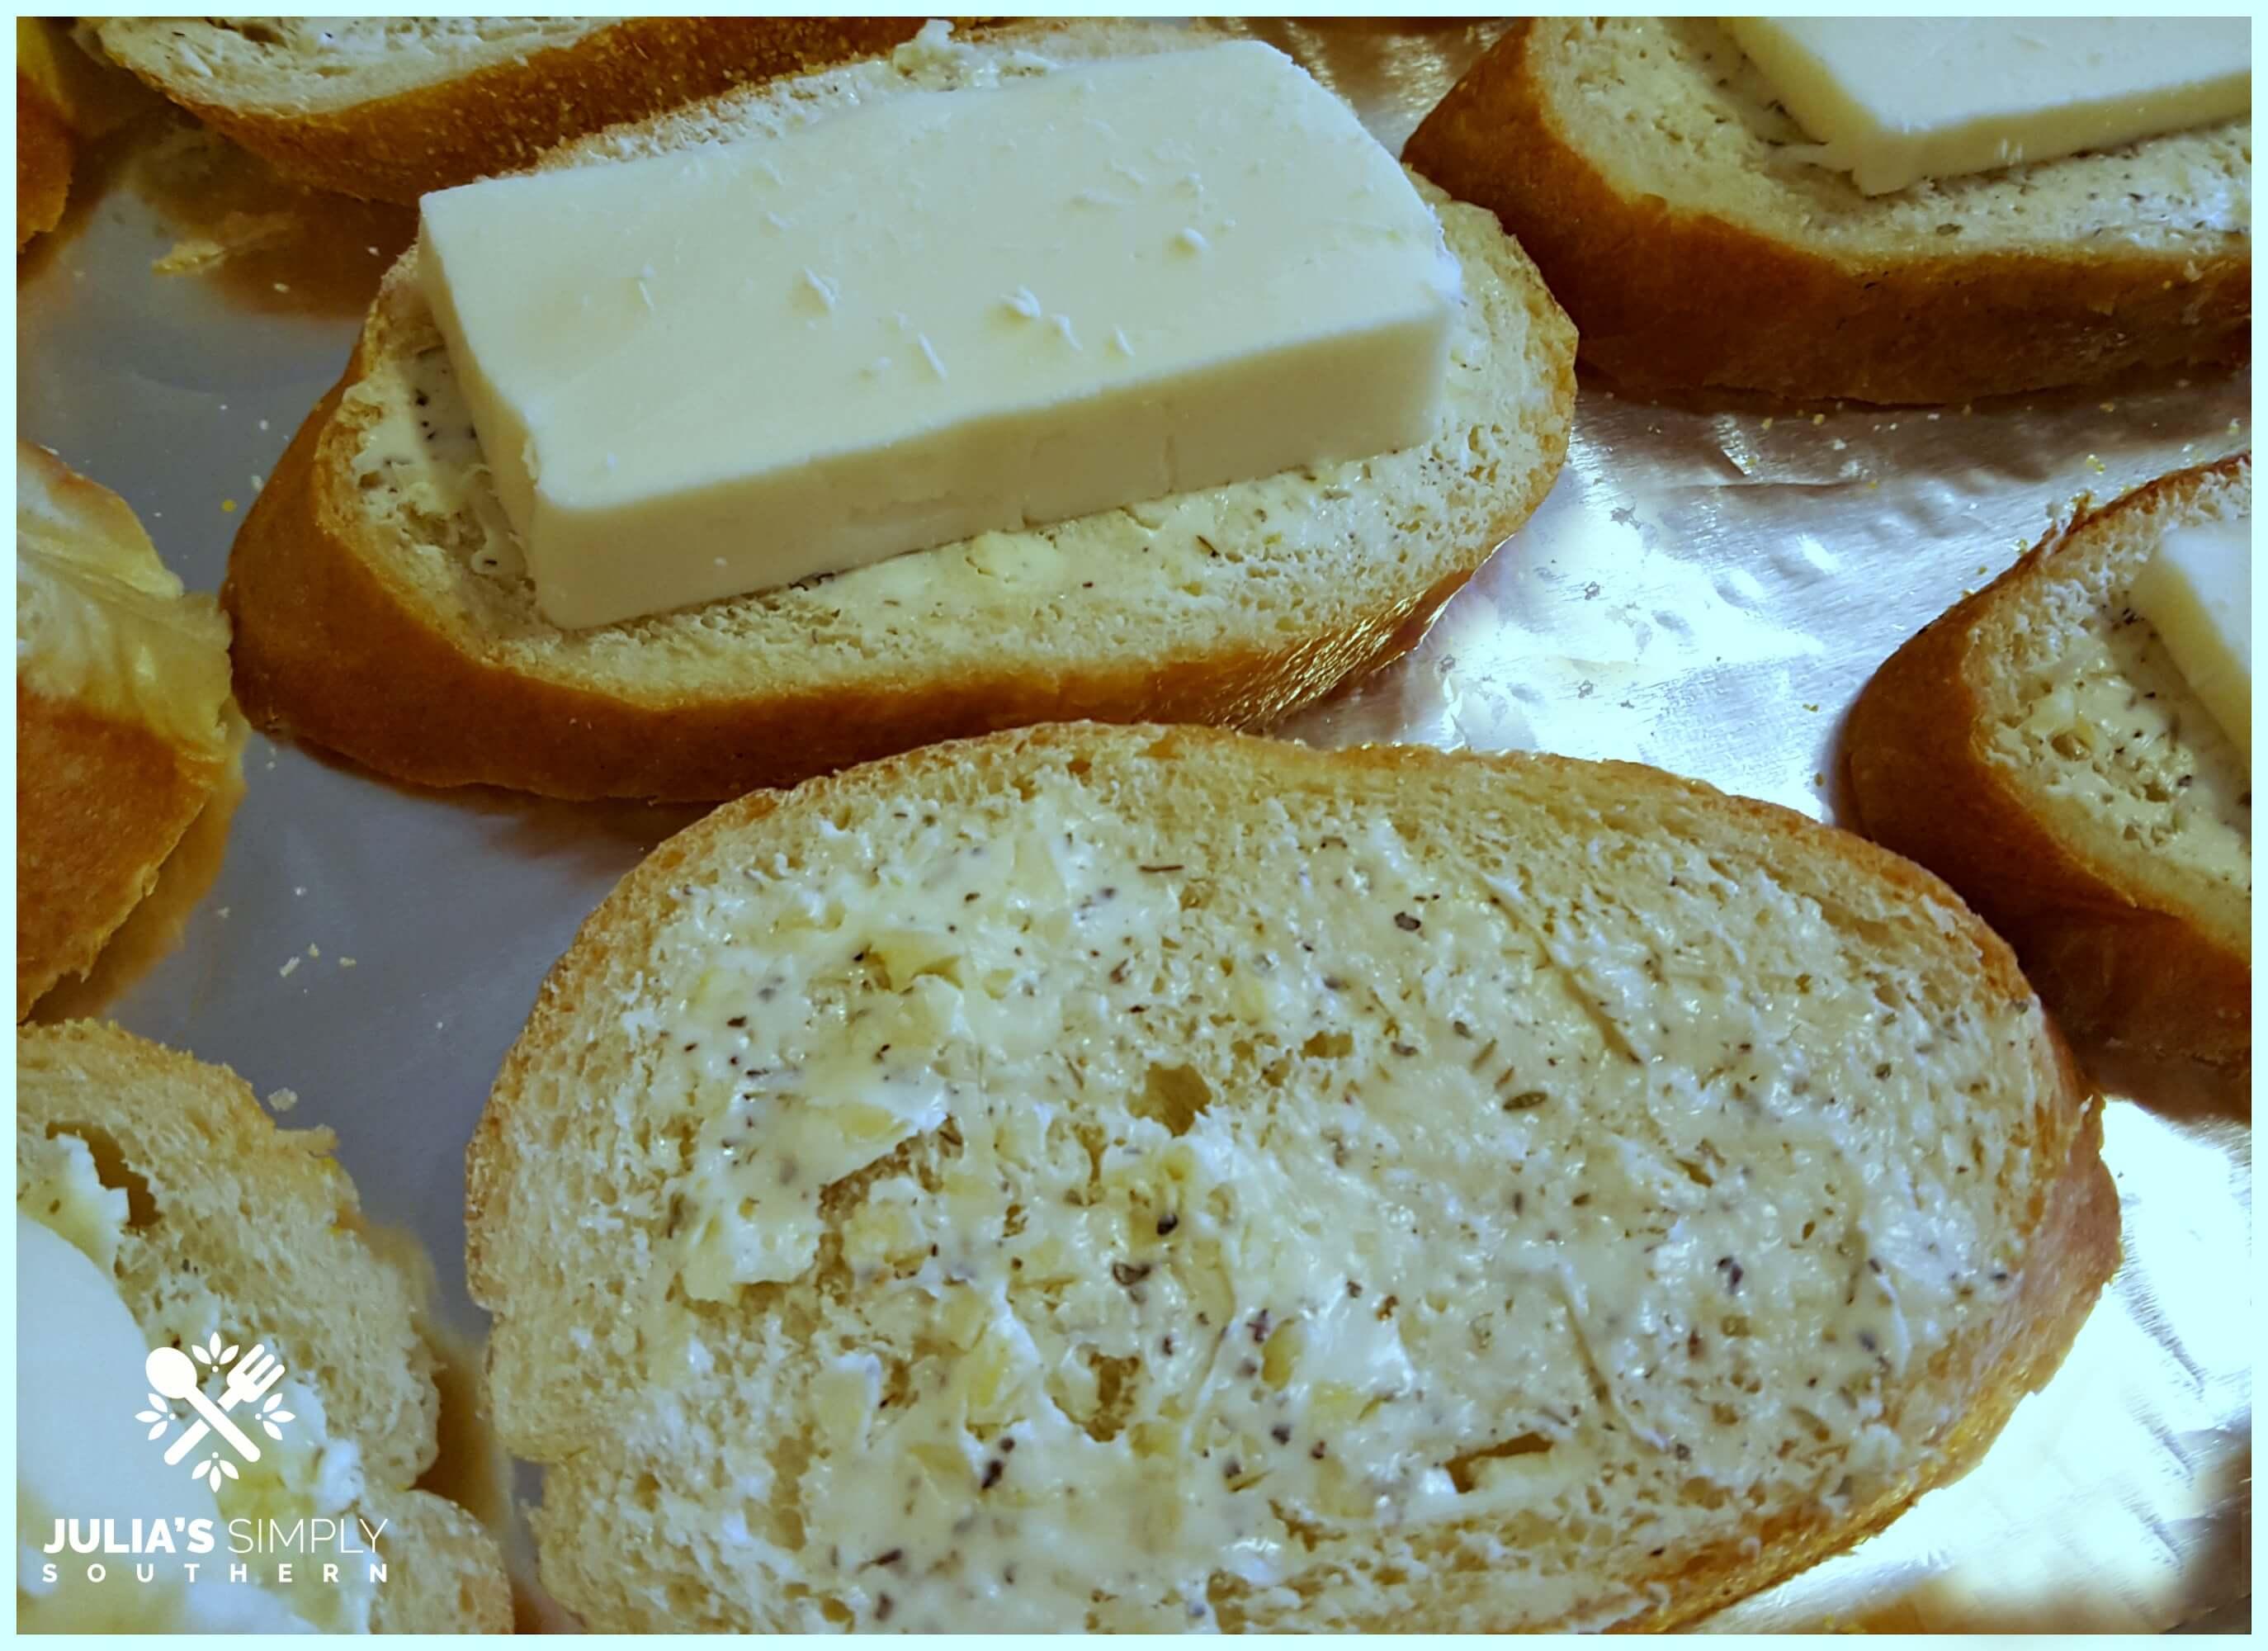 Garlic spread for bread